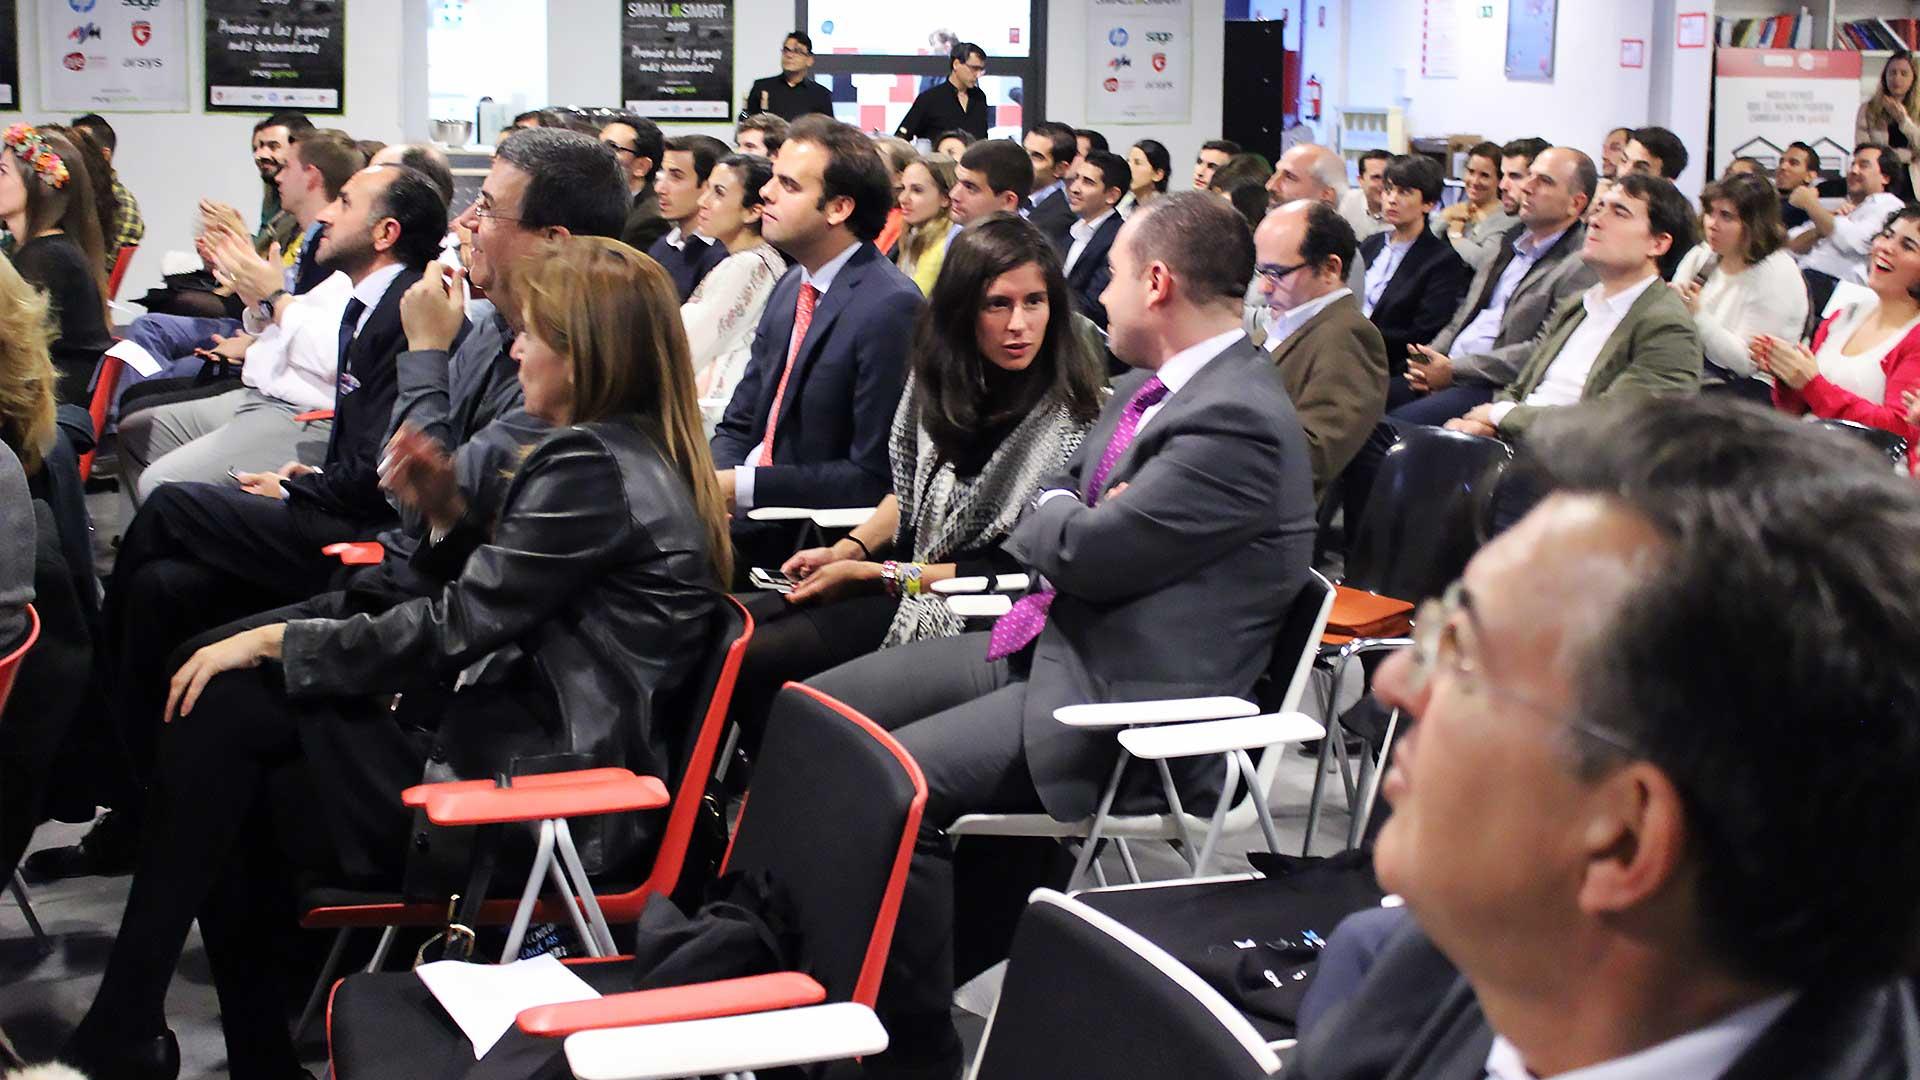 smallsmart-premios-startups-pymes-2015-publico-1